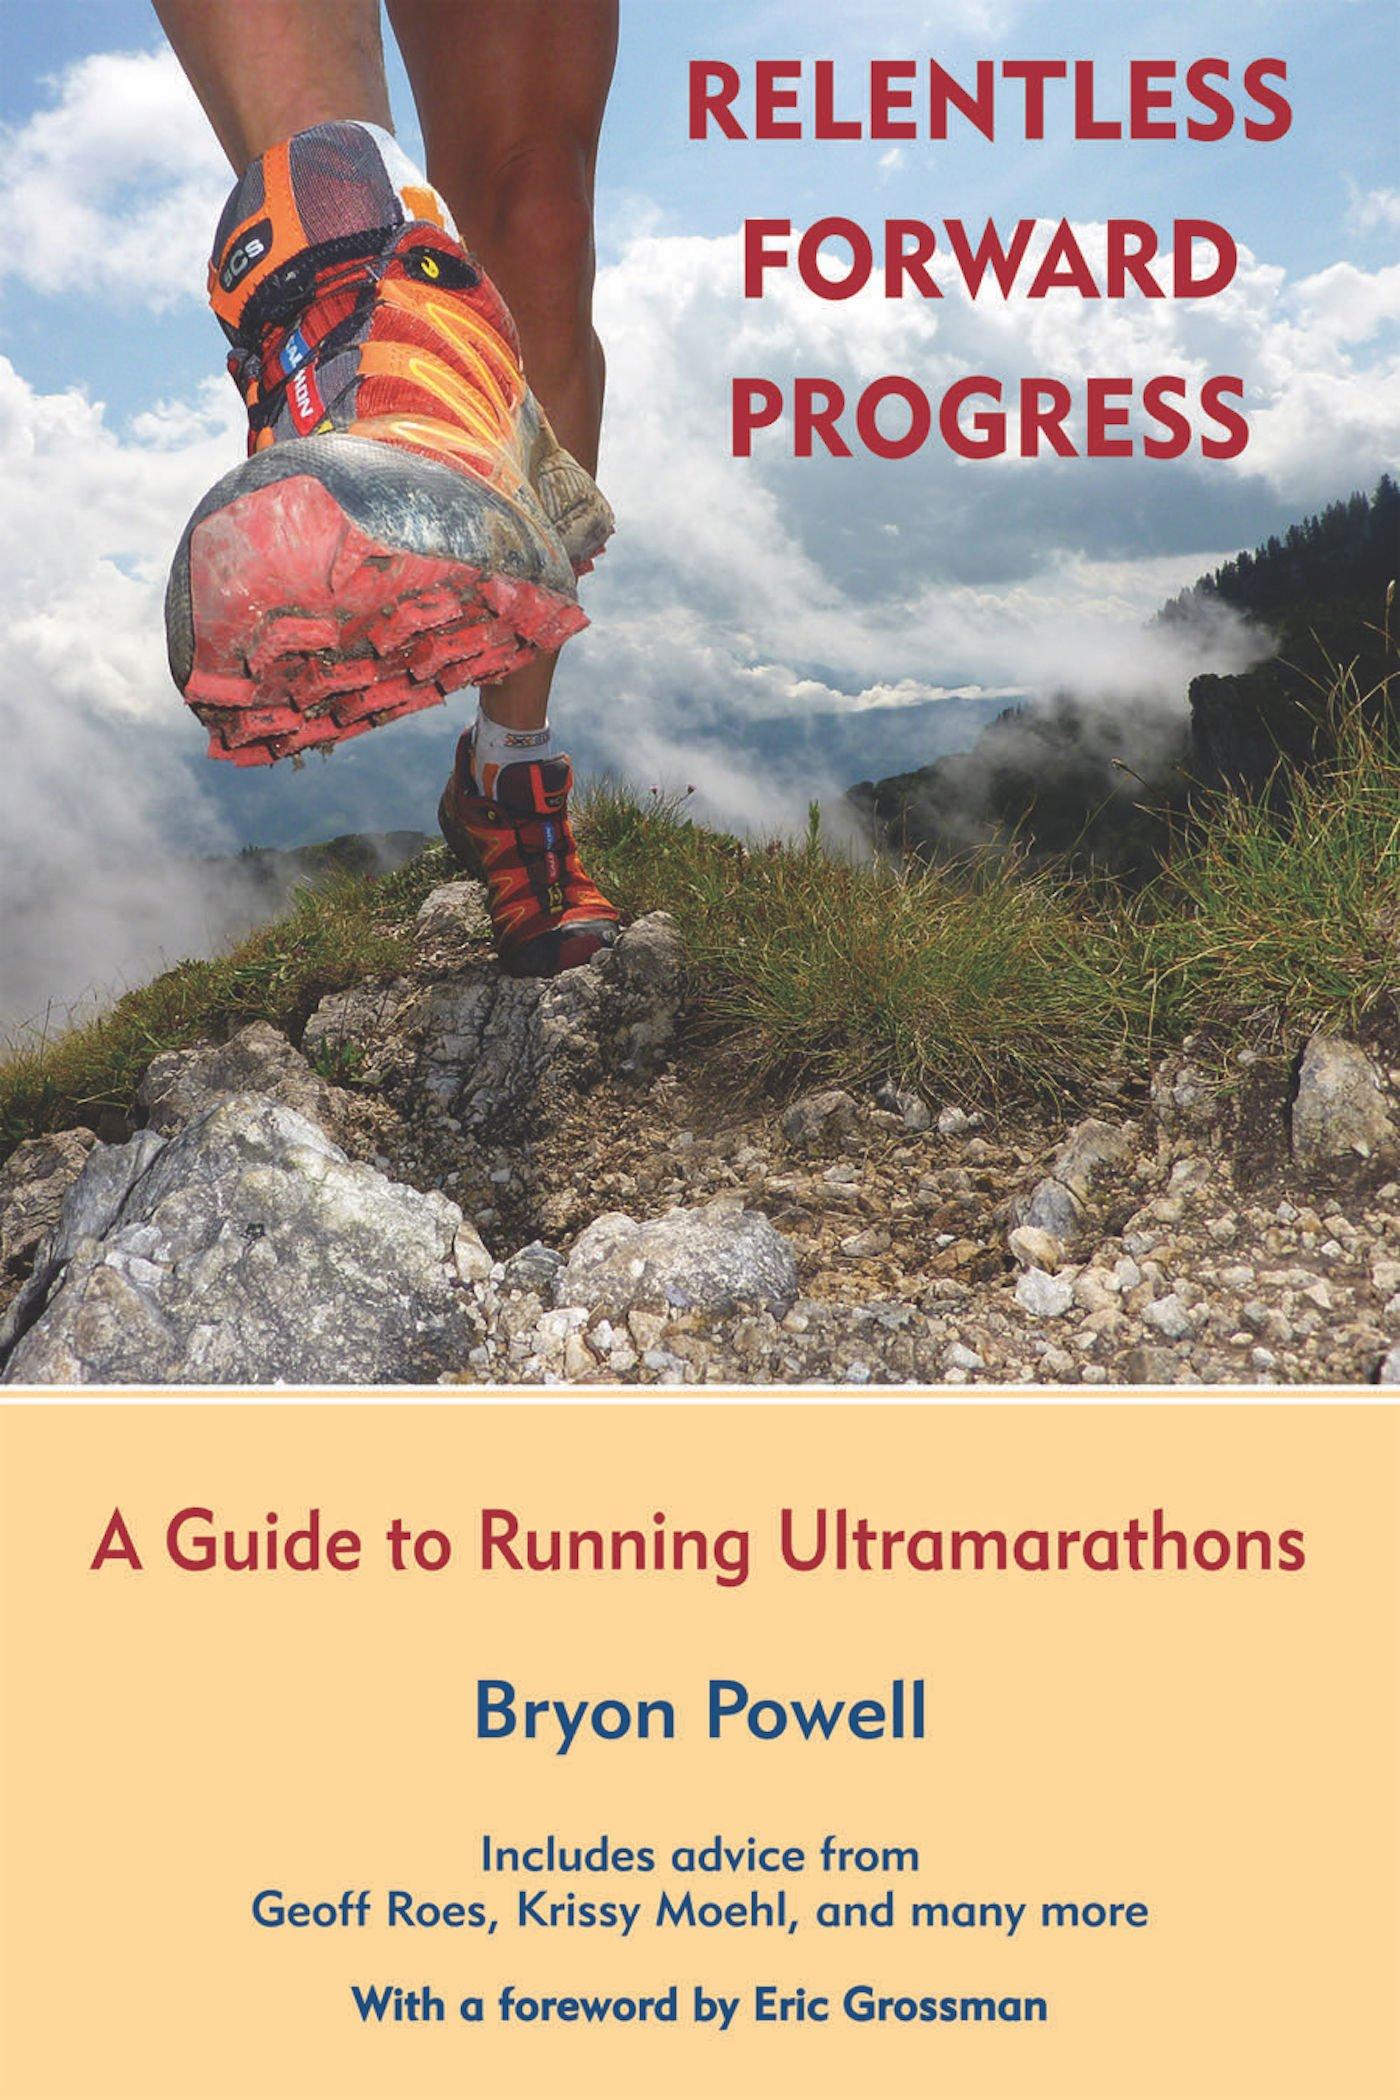 Relentless Forward Progress Running Ultramarathons product image